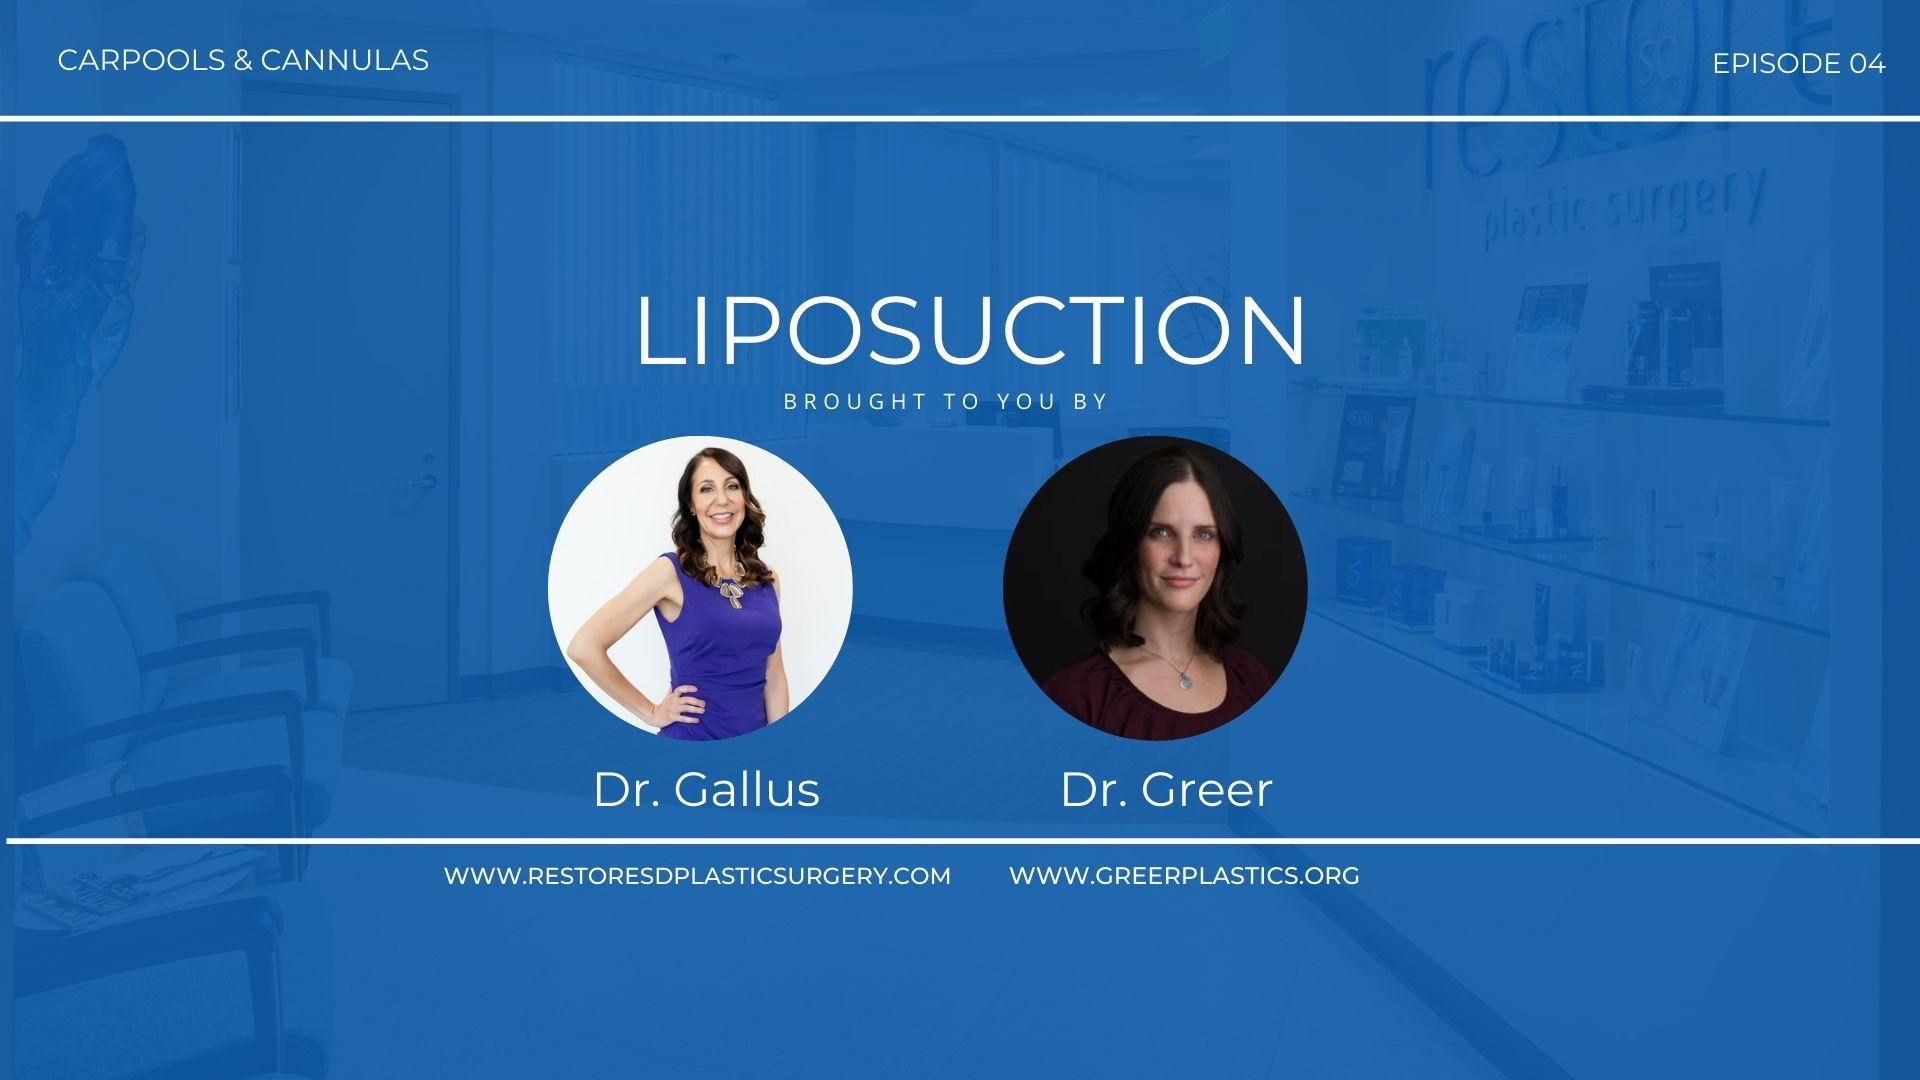 Carpools & Cannulas Episode 4 Liposuction